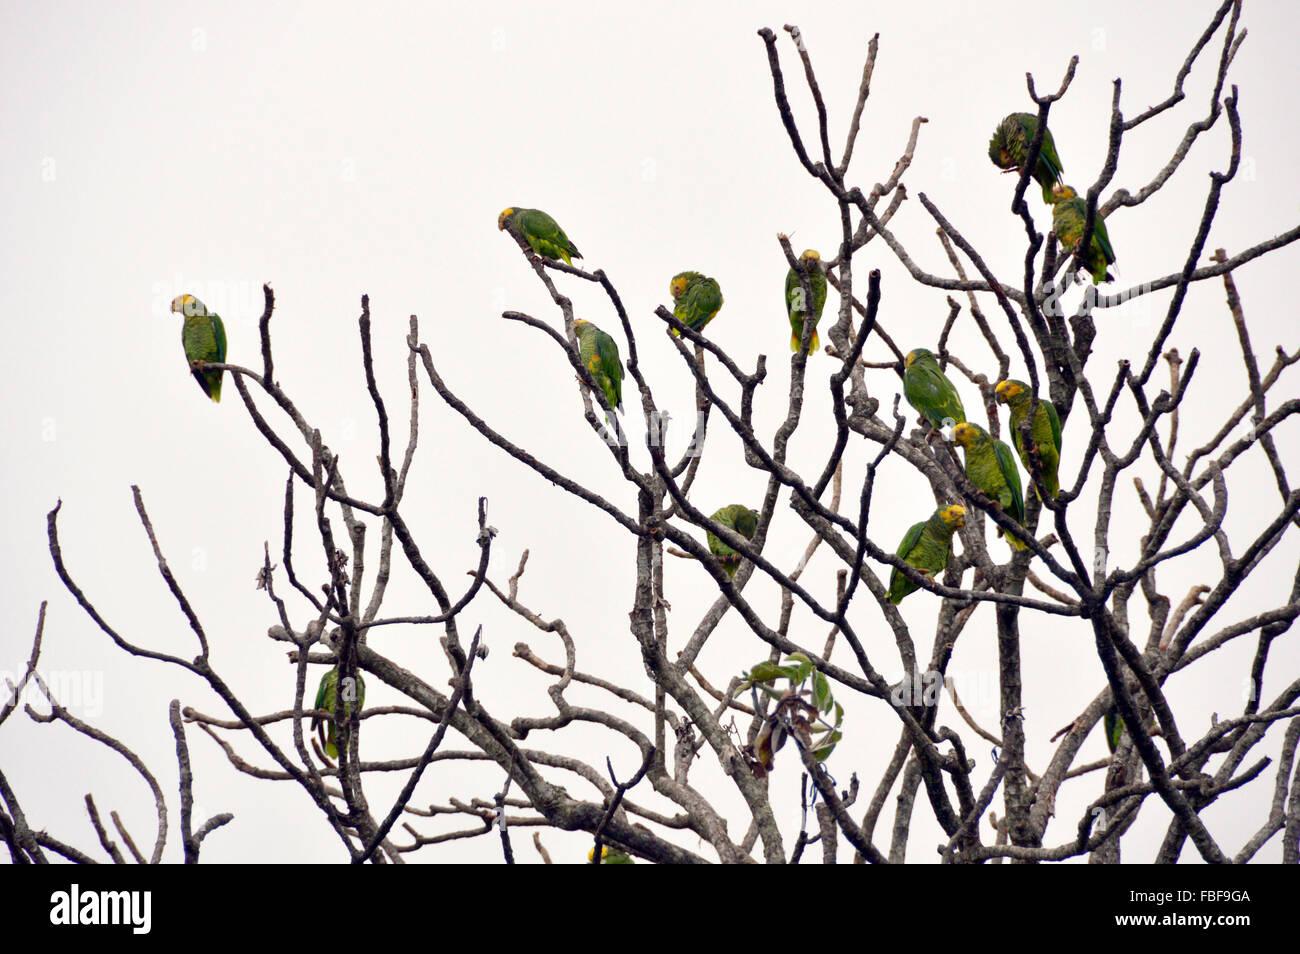 Parrots at chapada dos veadeiros psitacidae cerrado fauna - Stock Image